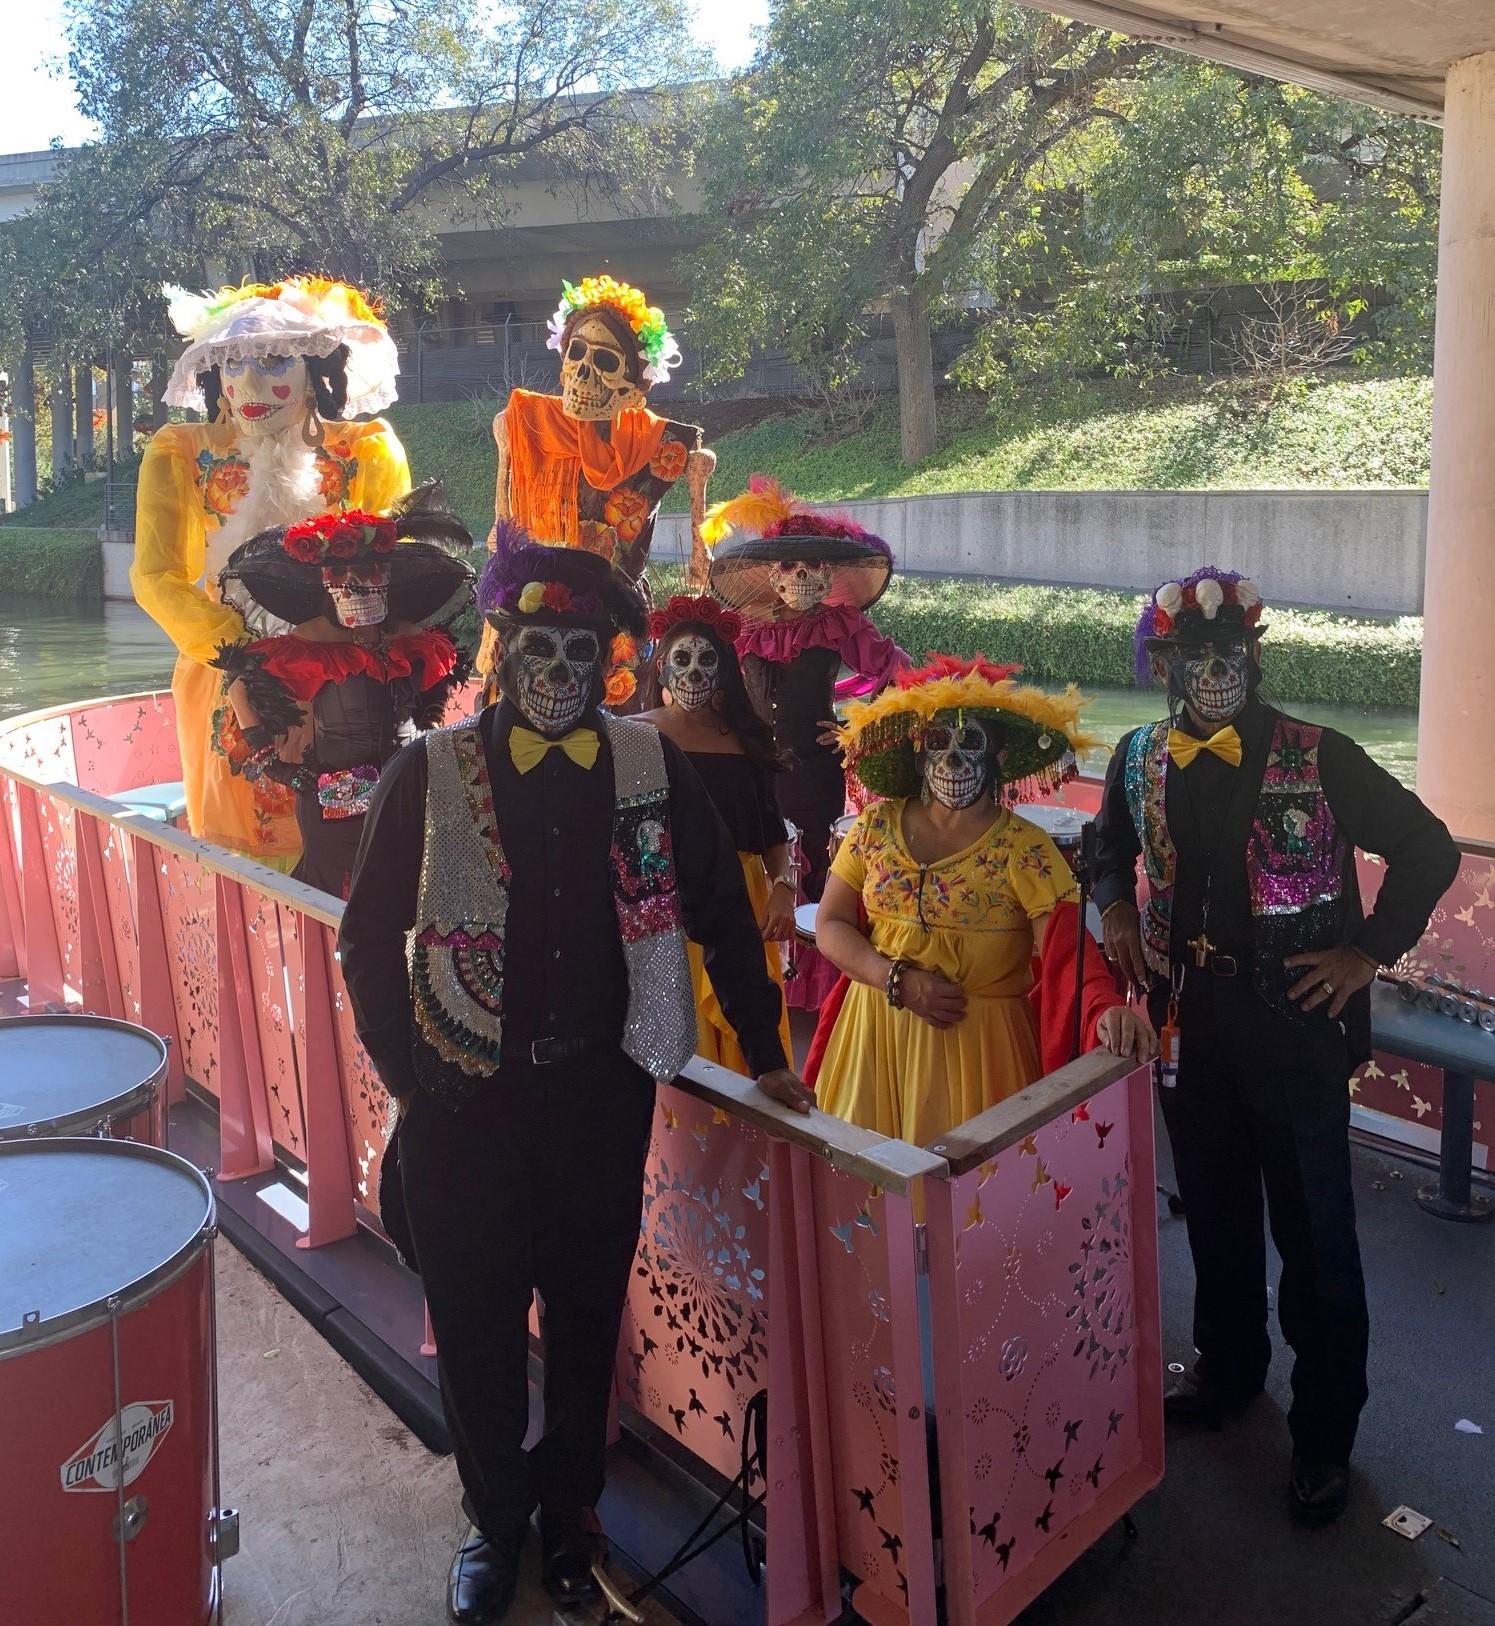 Las Monas Performance Group participates in the River Authority's Dia de los Muertos celebration on Nov. 1, 2020.